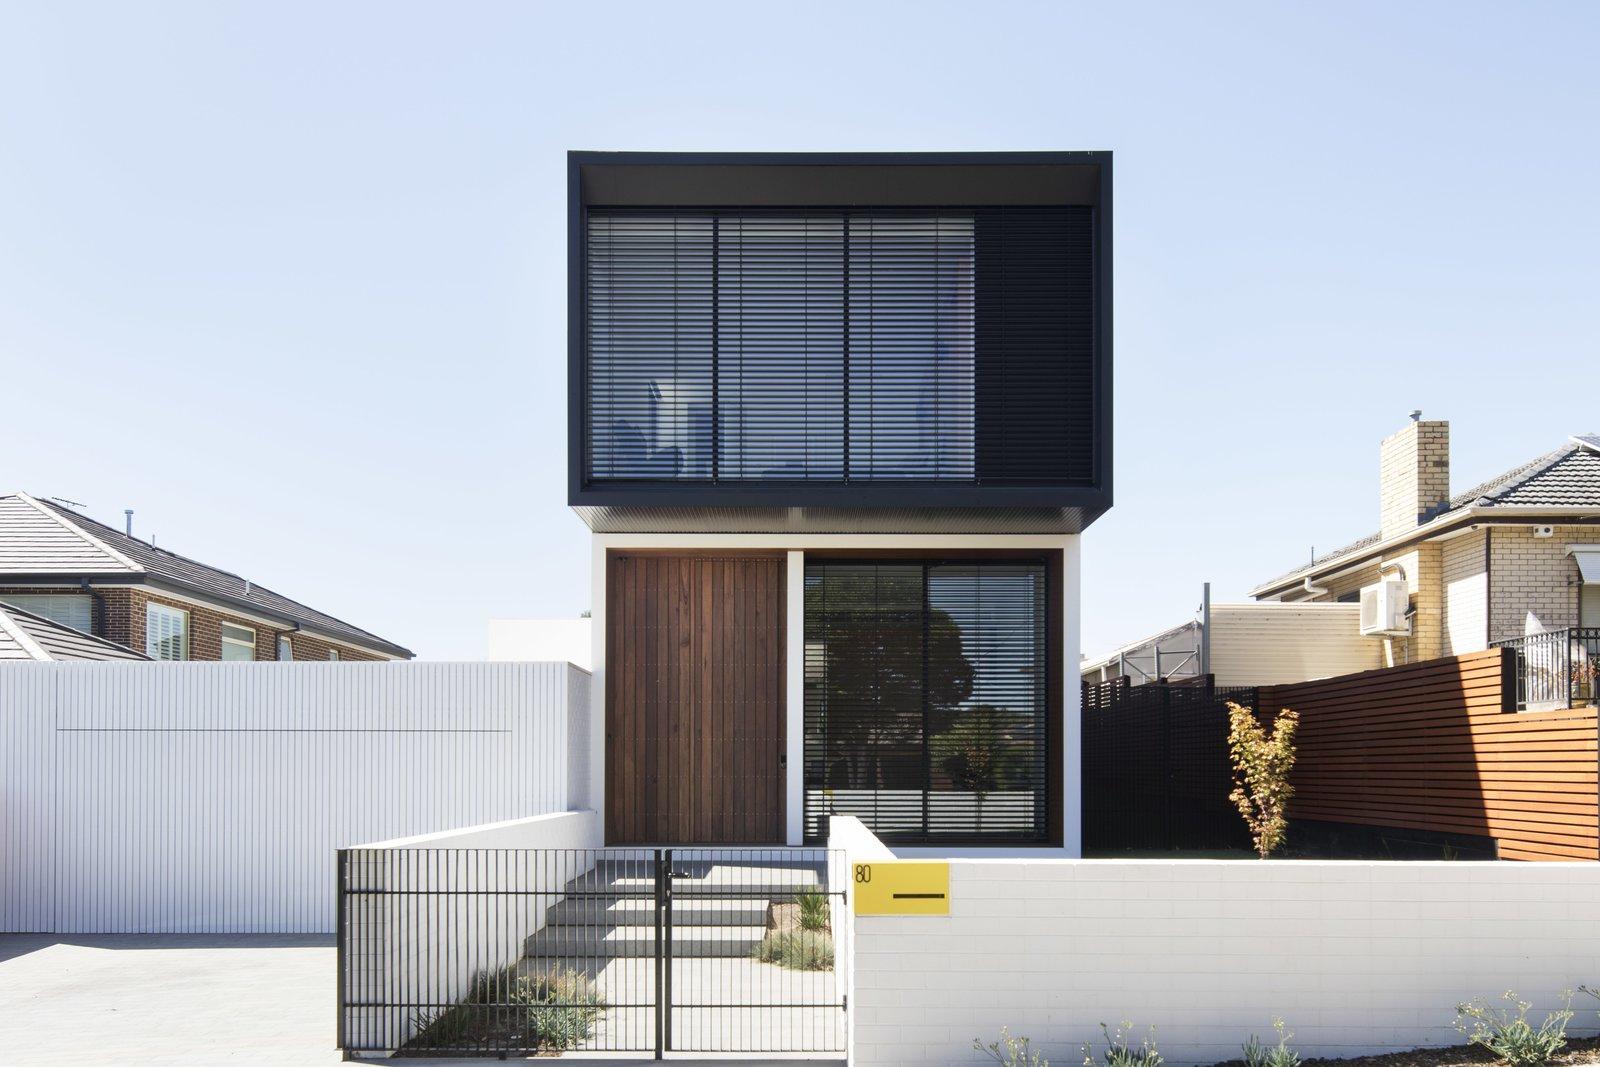 A Sleek Australian Dwelling Keeps its Cool With Passive Design